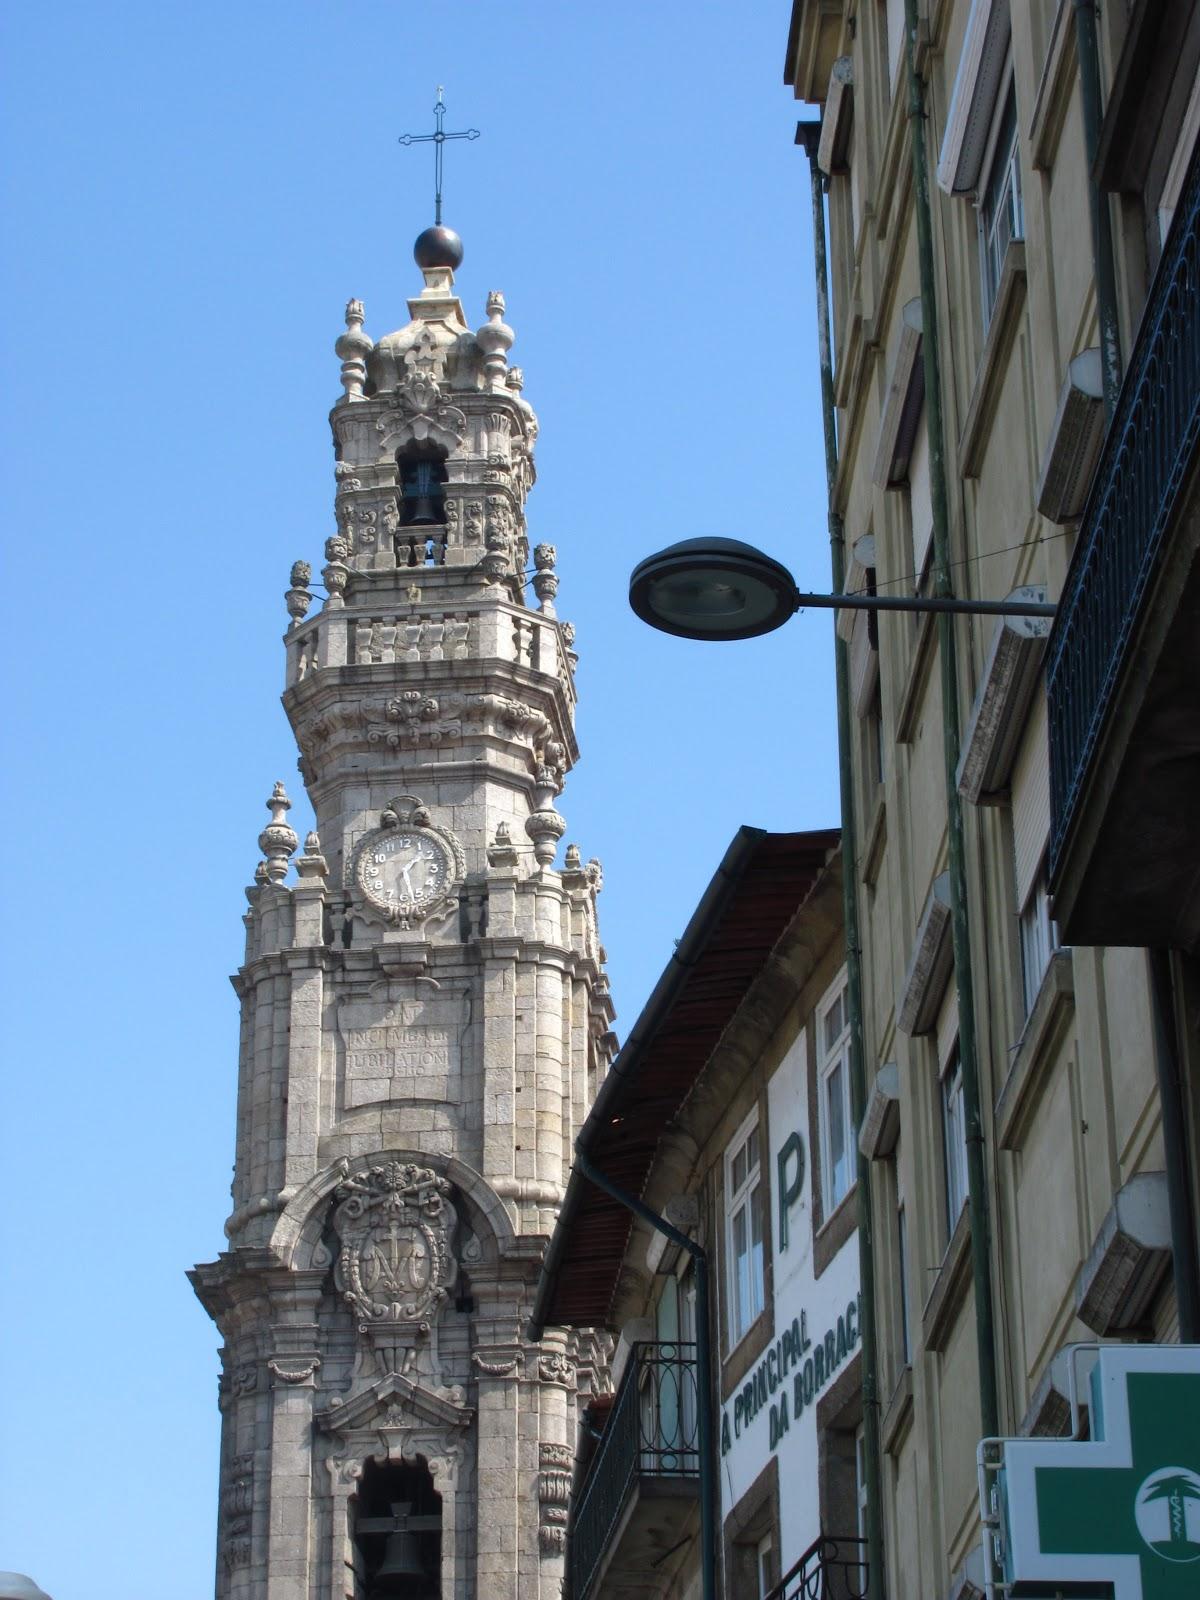 Clerigos Tower